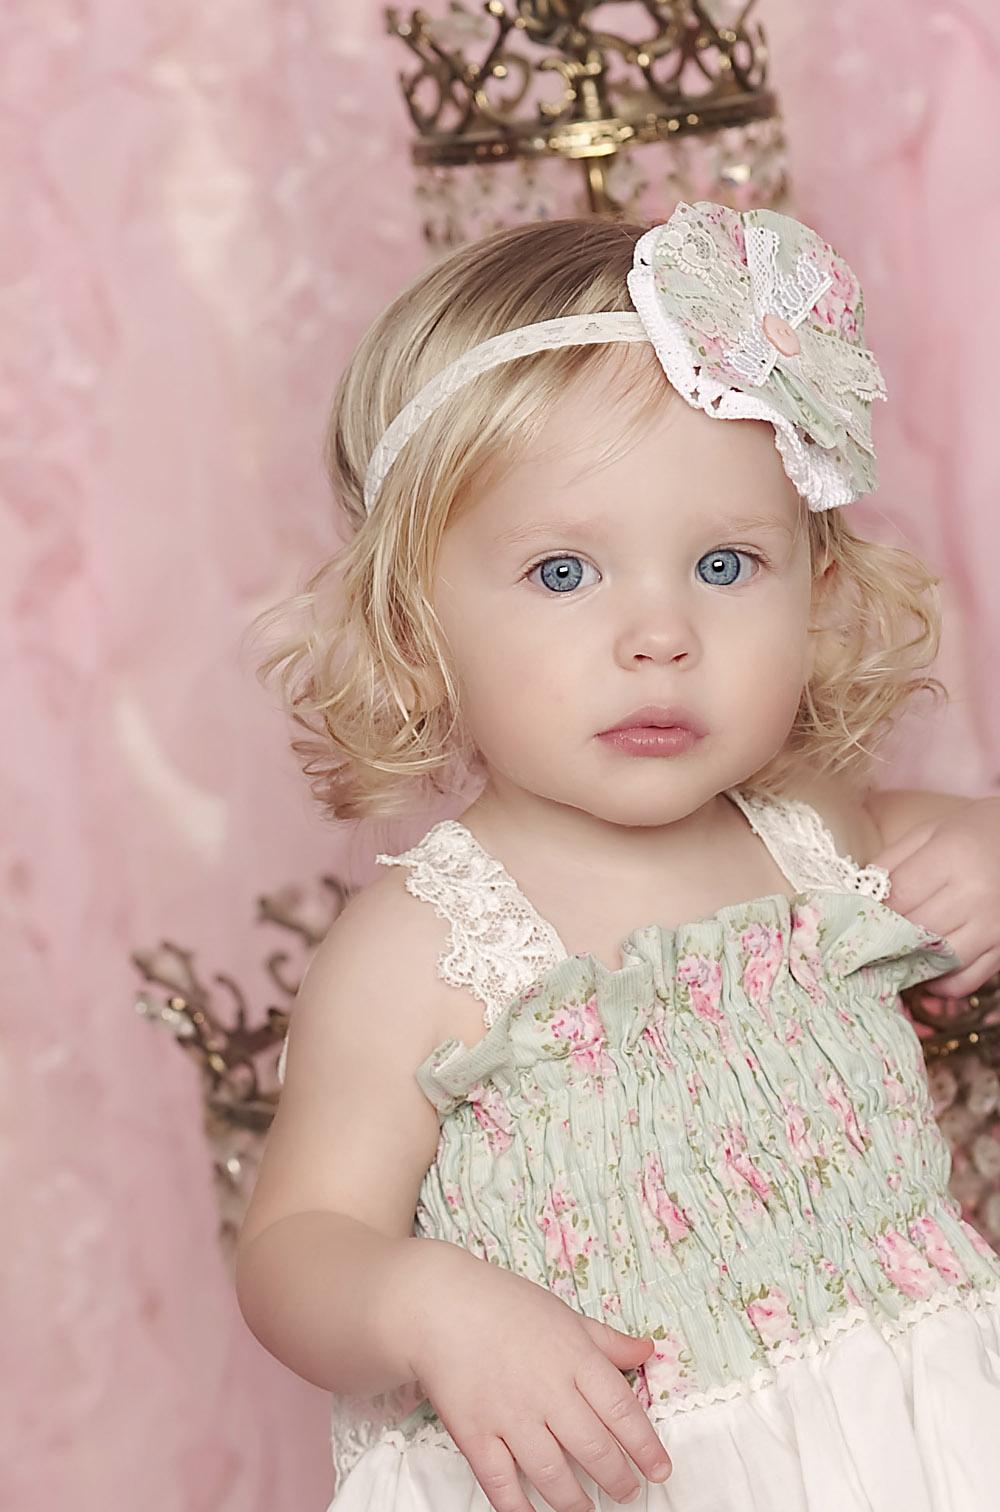 97dfc8386d3 Τα ρούχα, αυτά, για κοριτσάκια και αγοράκια είναι, πραγματικά, βγαλμένα από  παραμύθι. Χαρούμενα, γεμάτα χρώματα και μυρίζουν Άνοιξη!